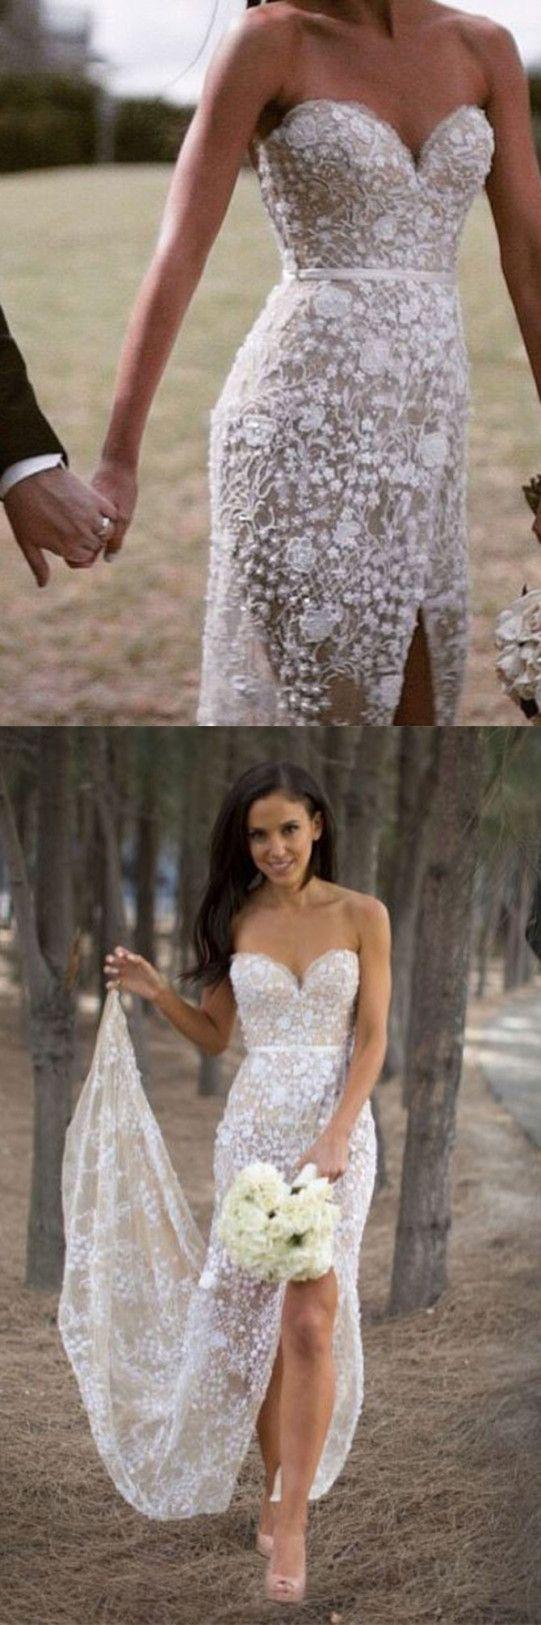 Sexy wedding dressesbeach wedding dresseslace wedding dresses